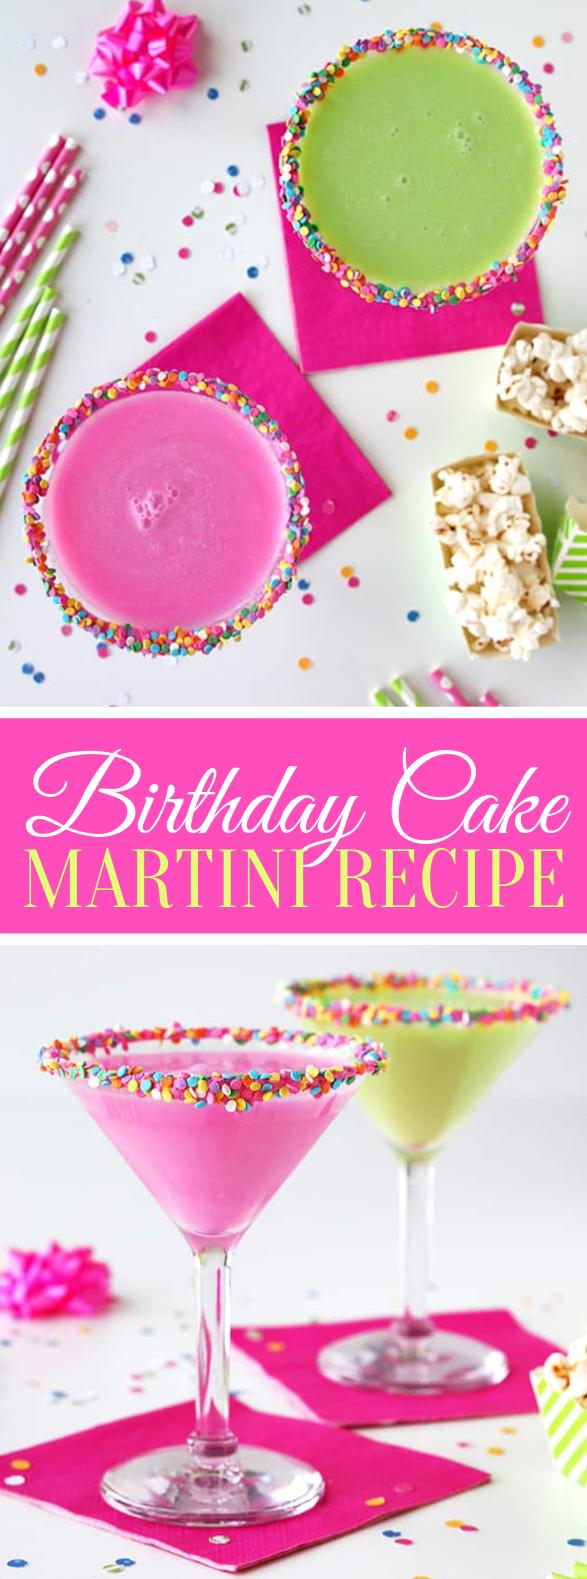 Birthday Cake Martini #drinks #cocktails #partydrink #birthdayrecipes #kidfriendly